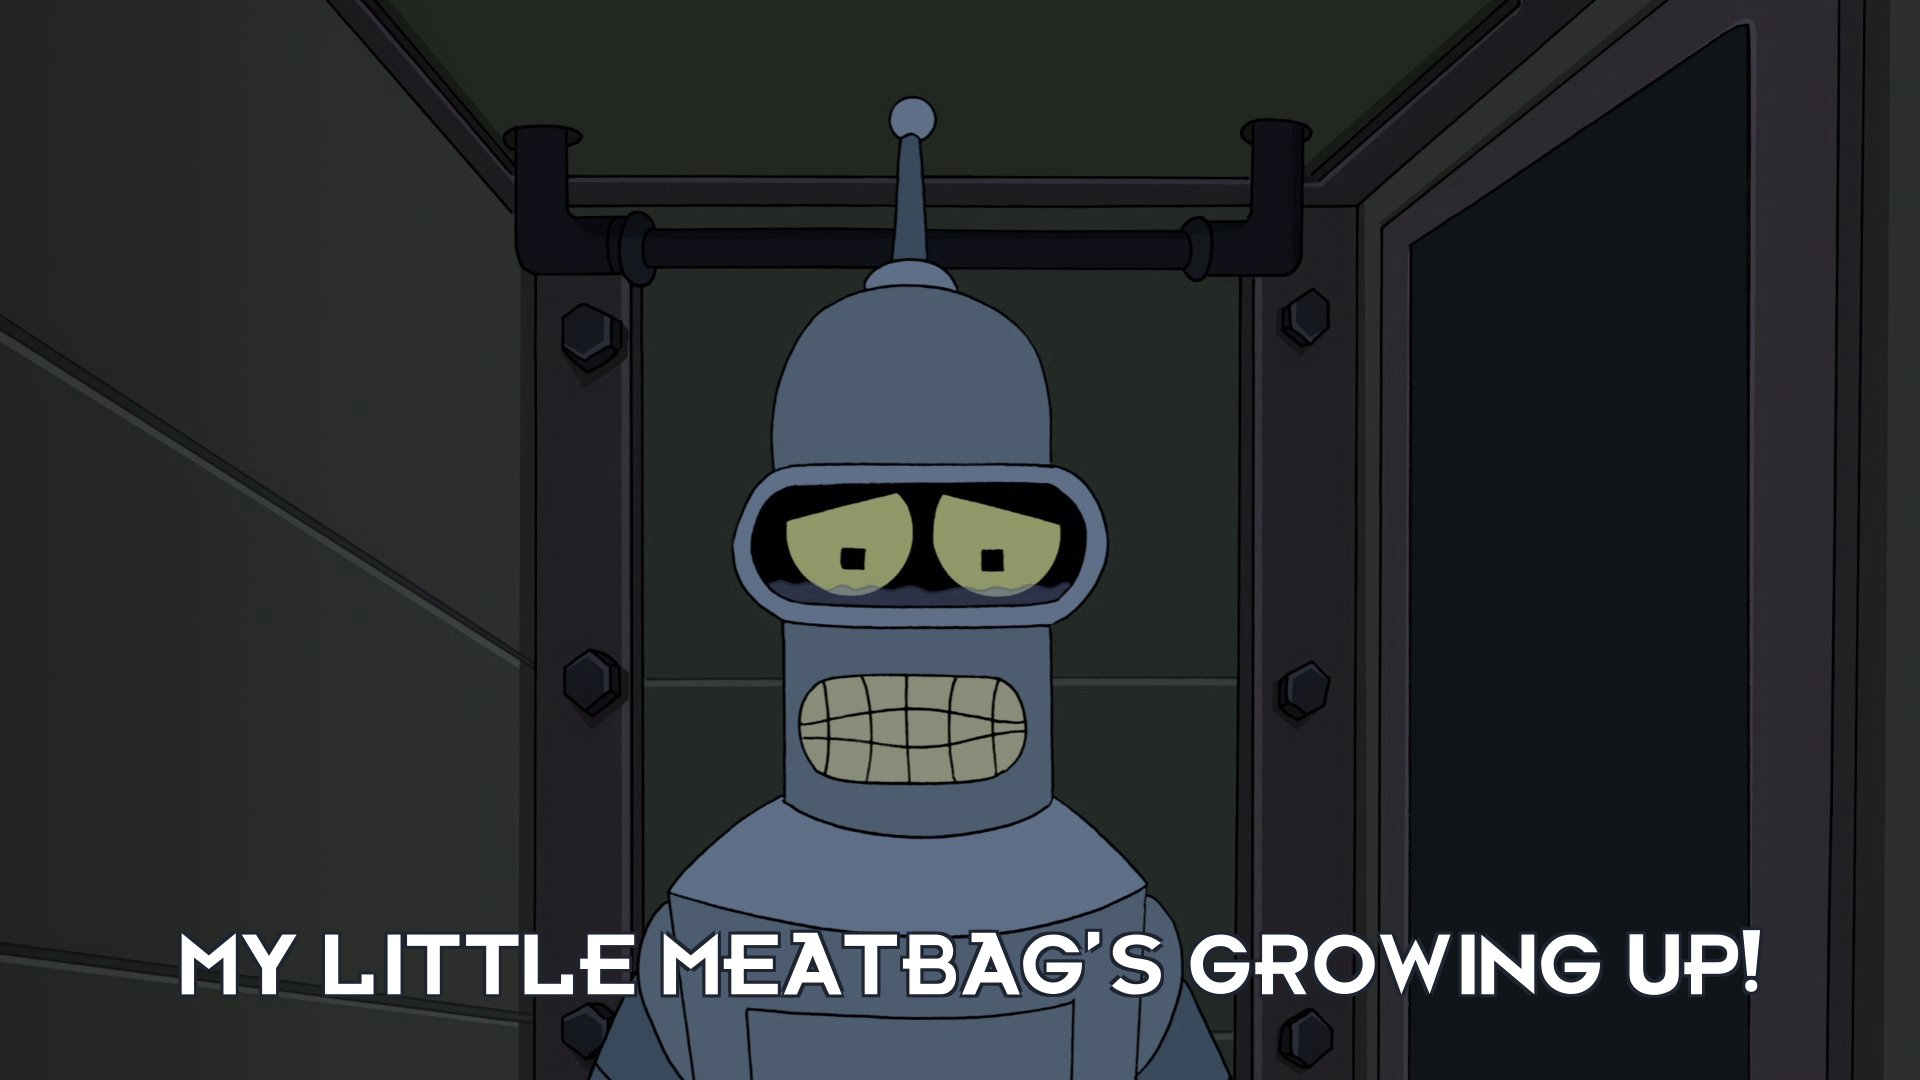 Bender Bending Rodriguez: My little meatbag's growing up!